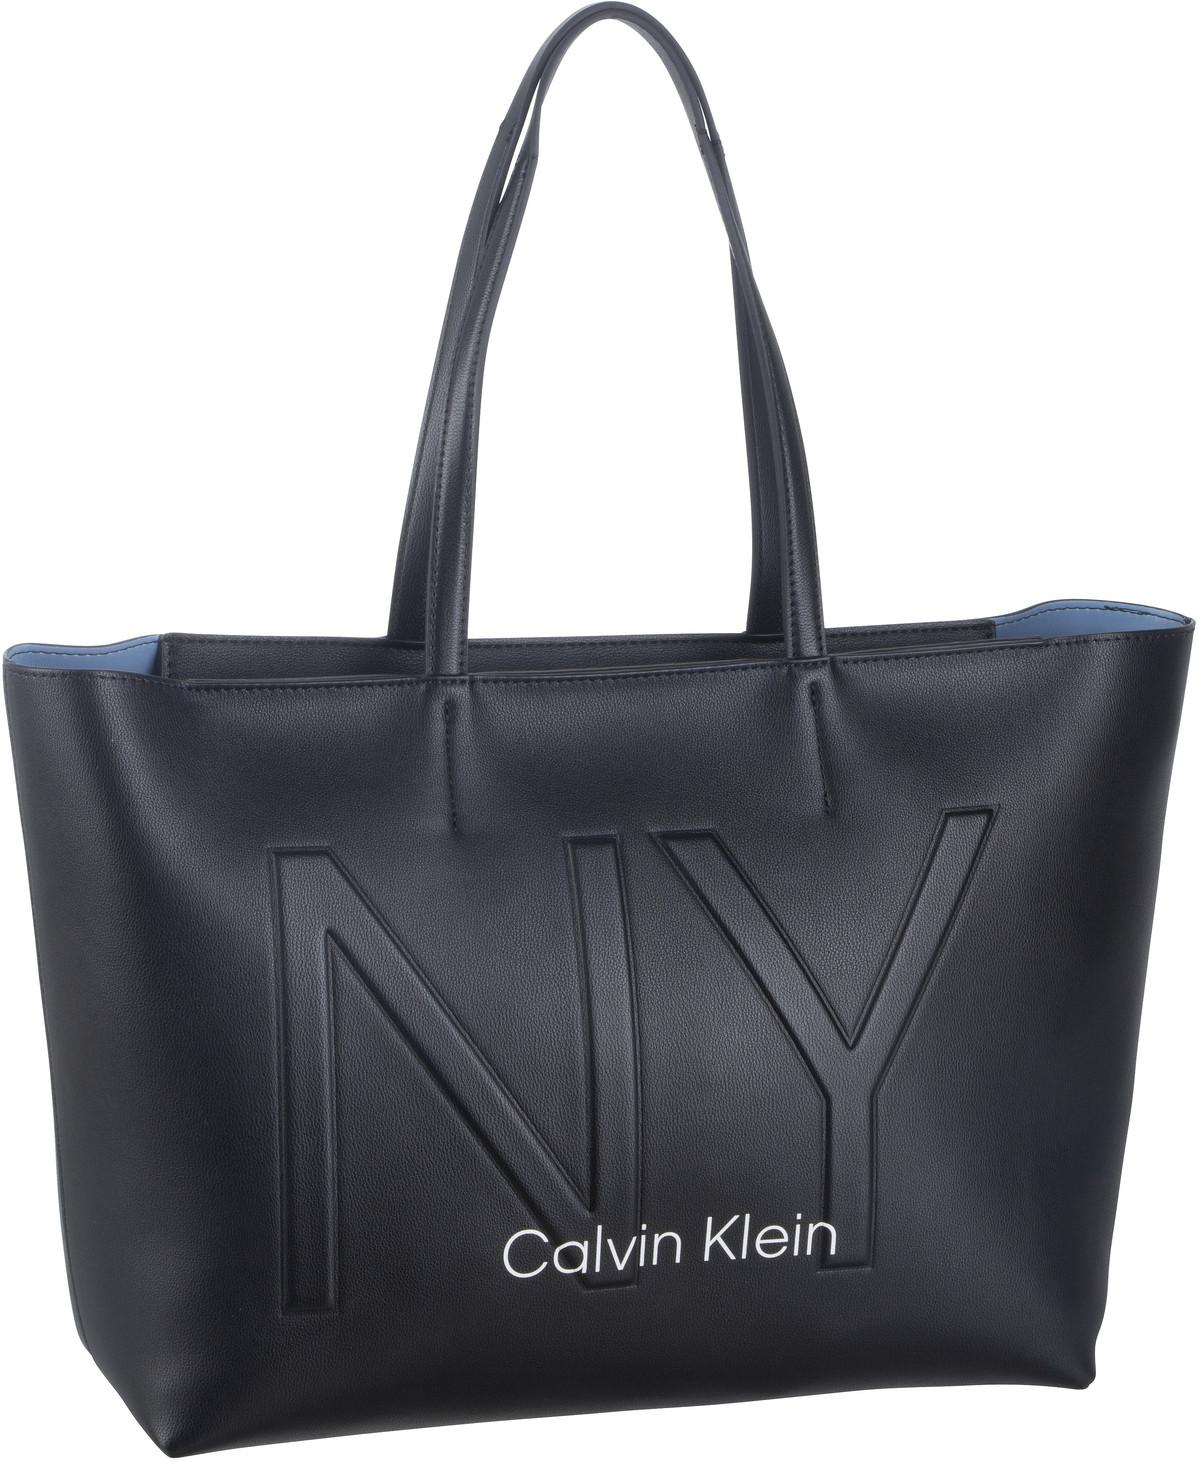 Handtasche CK Must PSP20 Medium Shopper NY Black